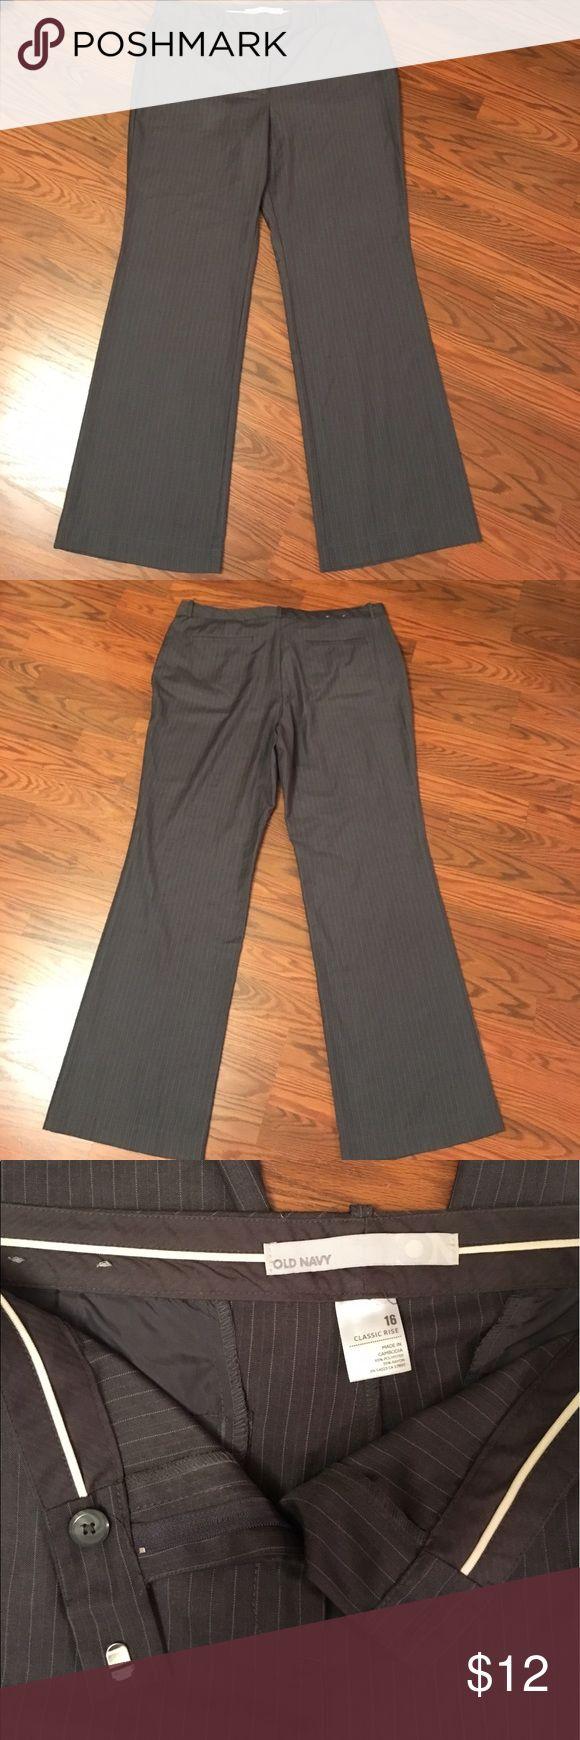 "NWOT Old Navy Dress Pants Never worn! Gray pinstripe dress pants/trousers, ""Classic Rise"", wide leg, 33"" inseam, belt loops, size 16 Old Navy Pants Trousers"